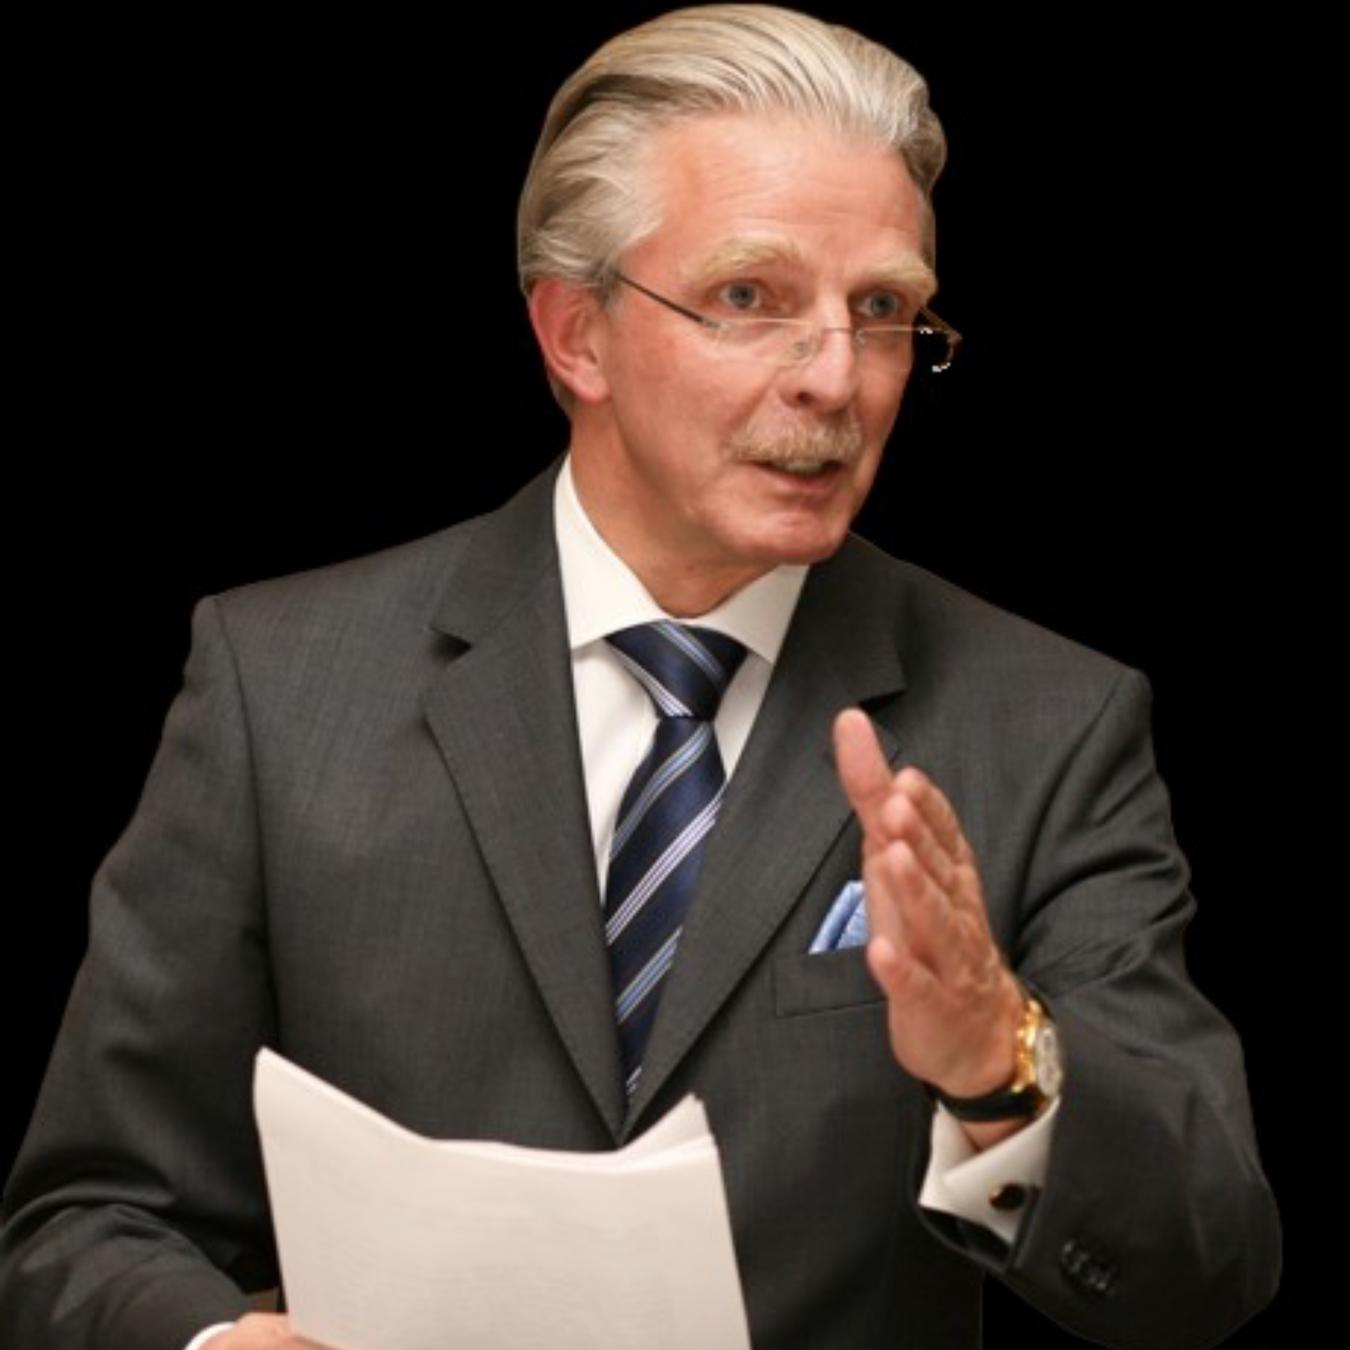 Michael Knauff